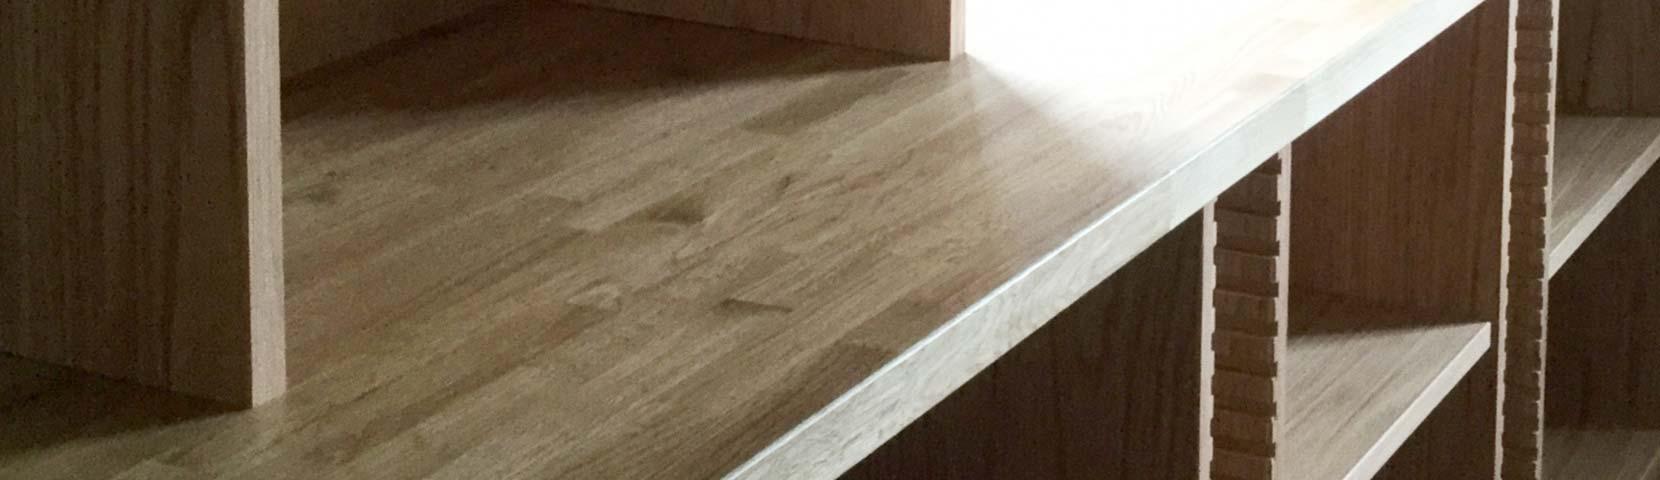 Bespoke wooden furniture